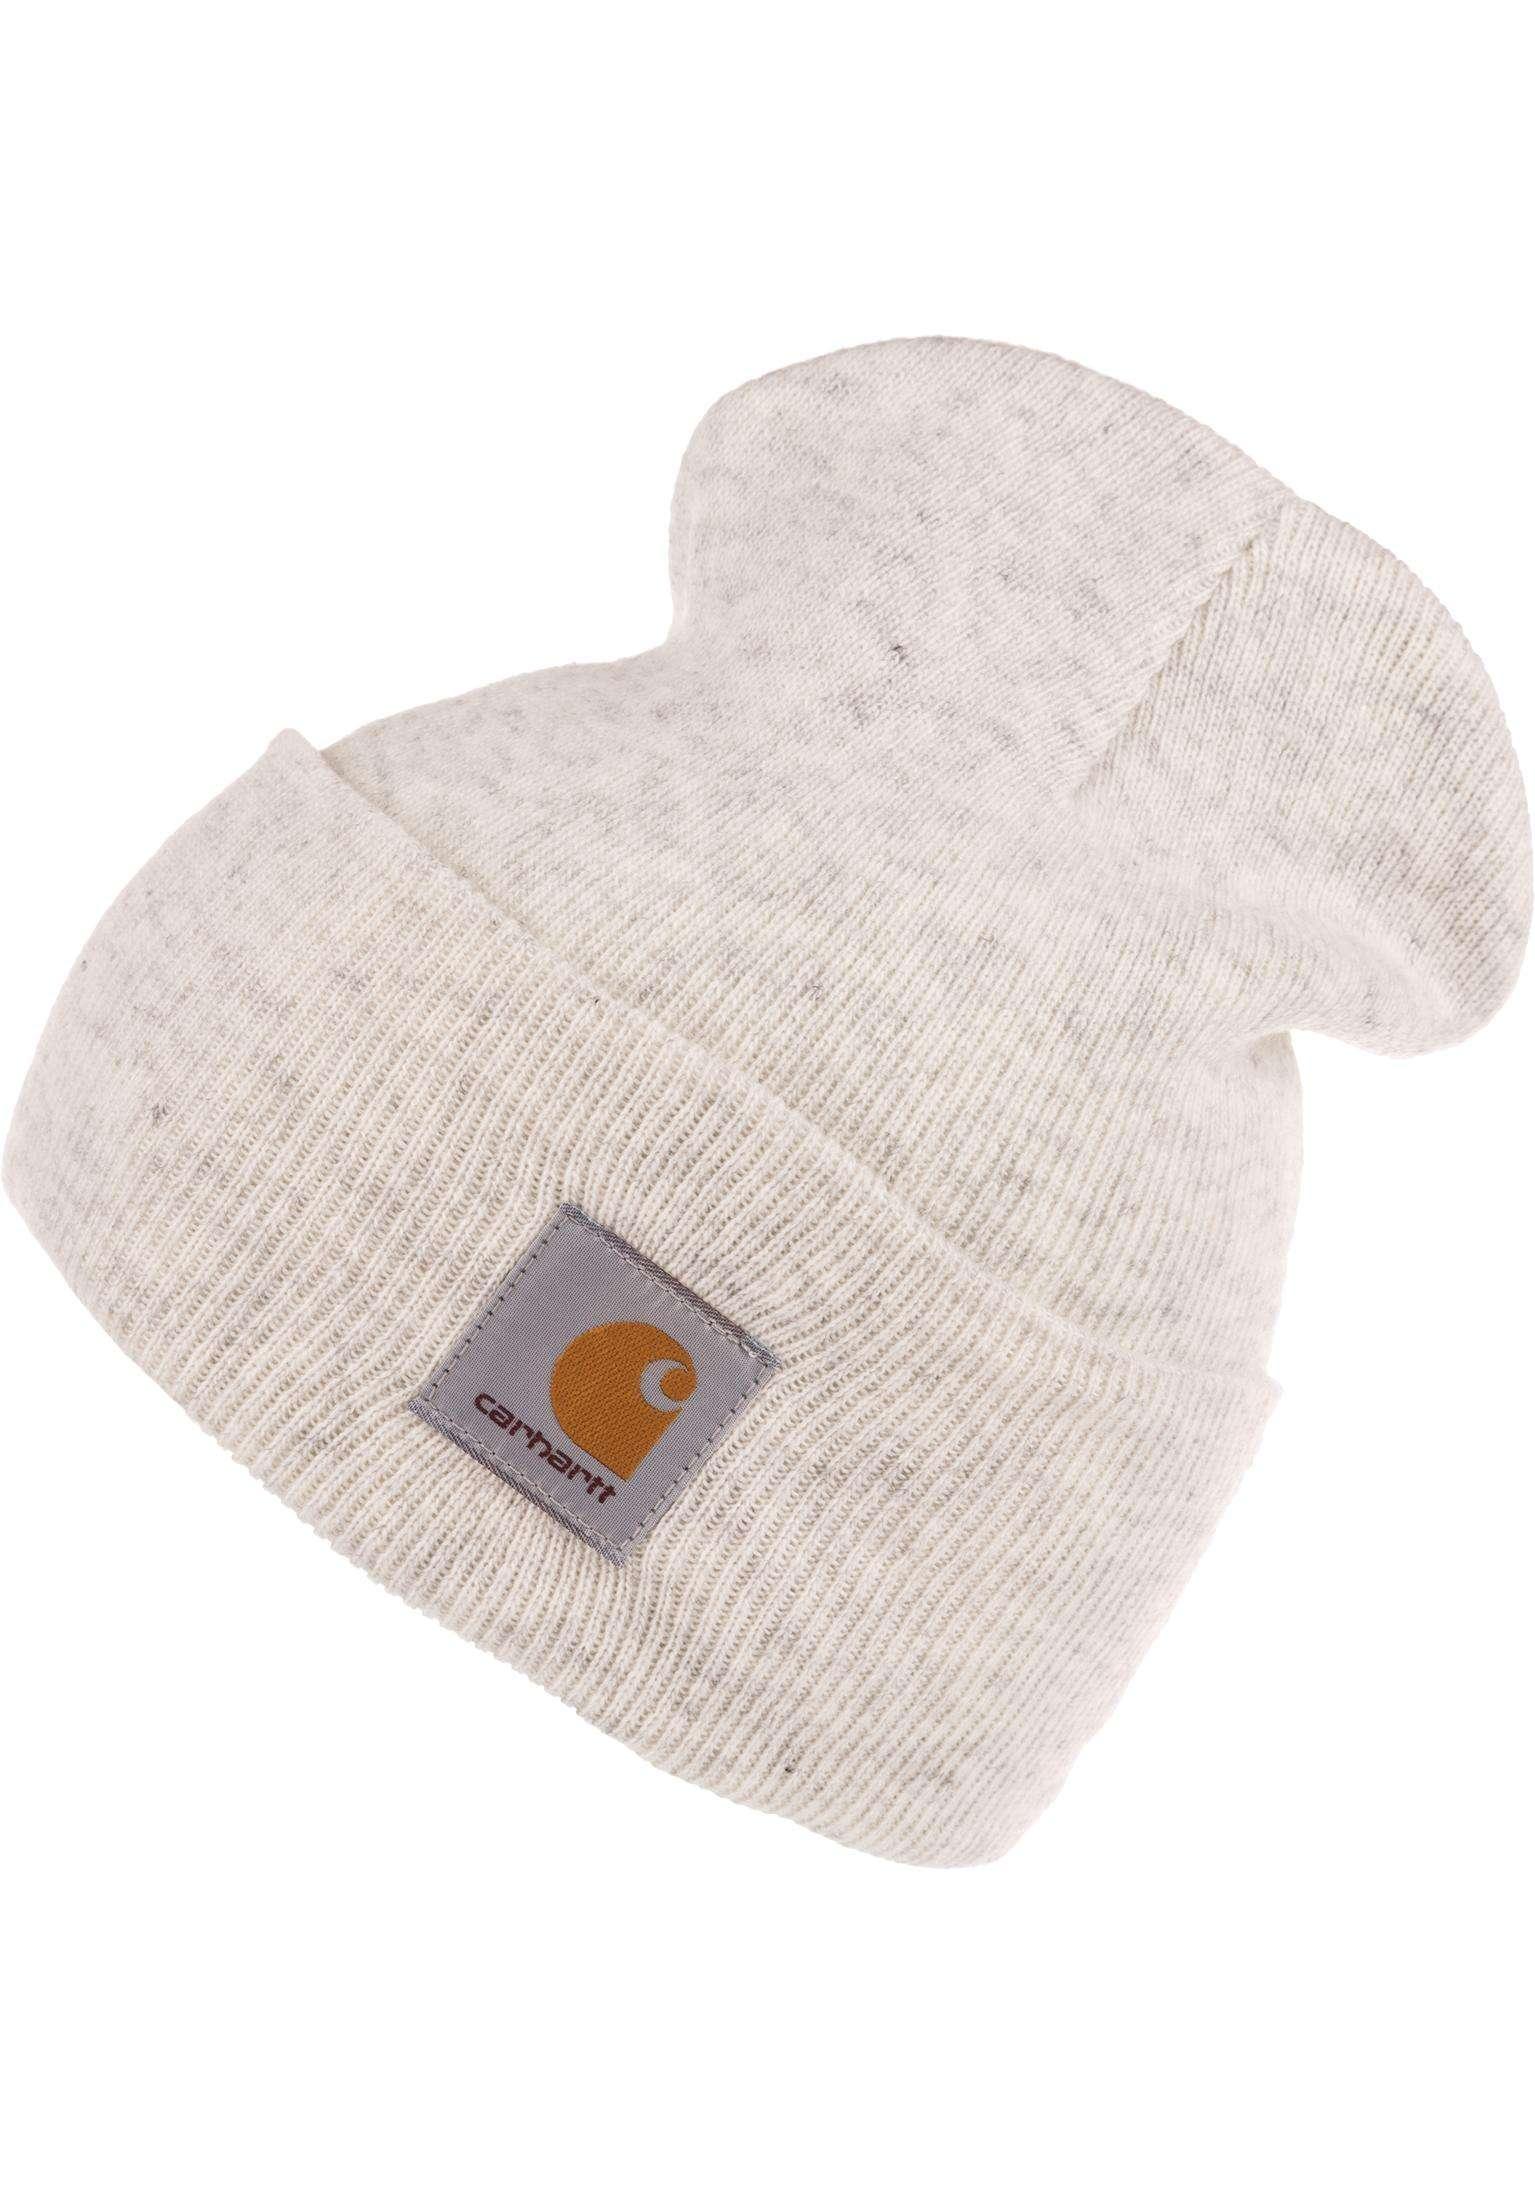 e69ceca794f37 Acrylic Watch Hat Carhartt WIP Beanies in ashheather for Men